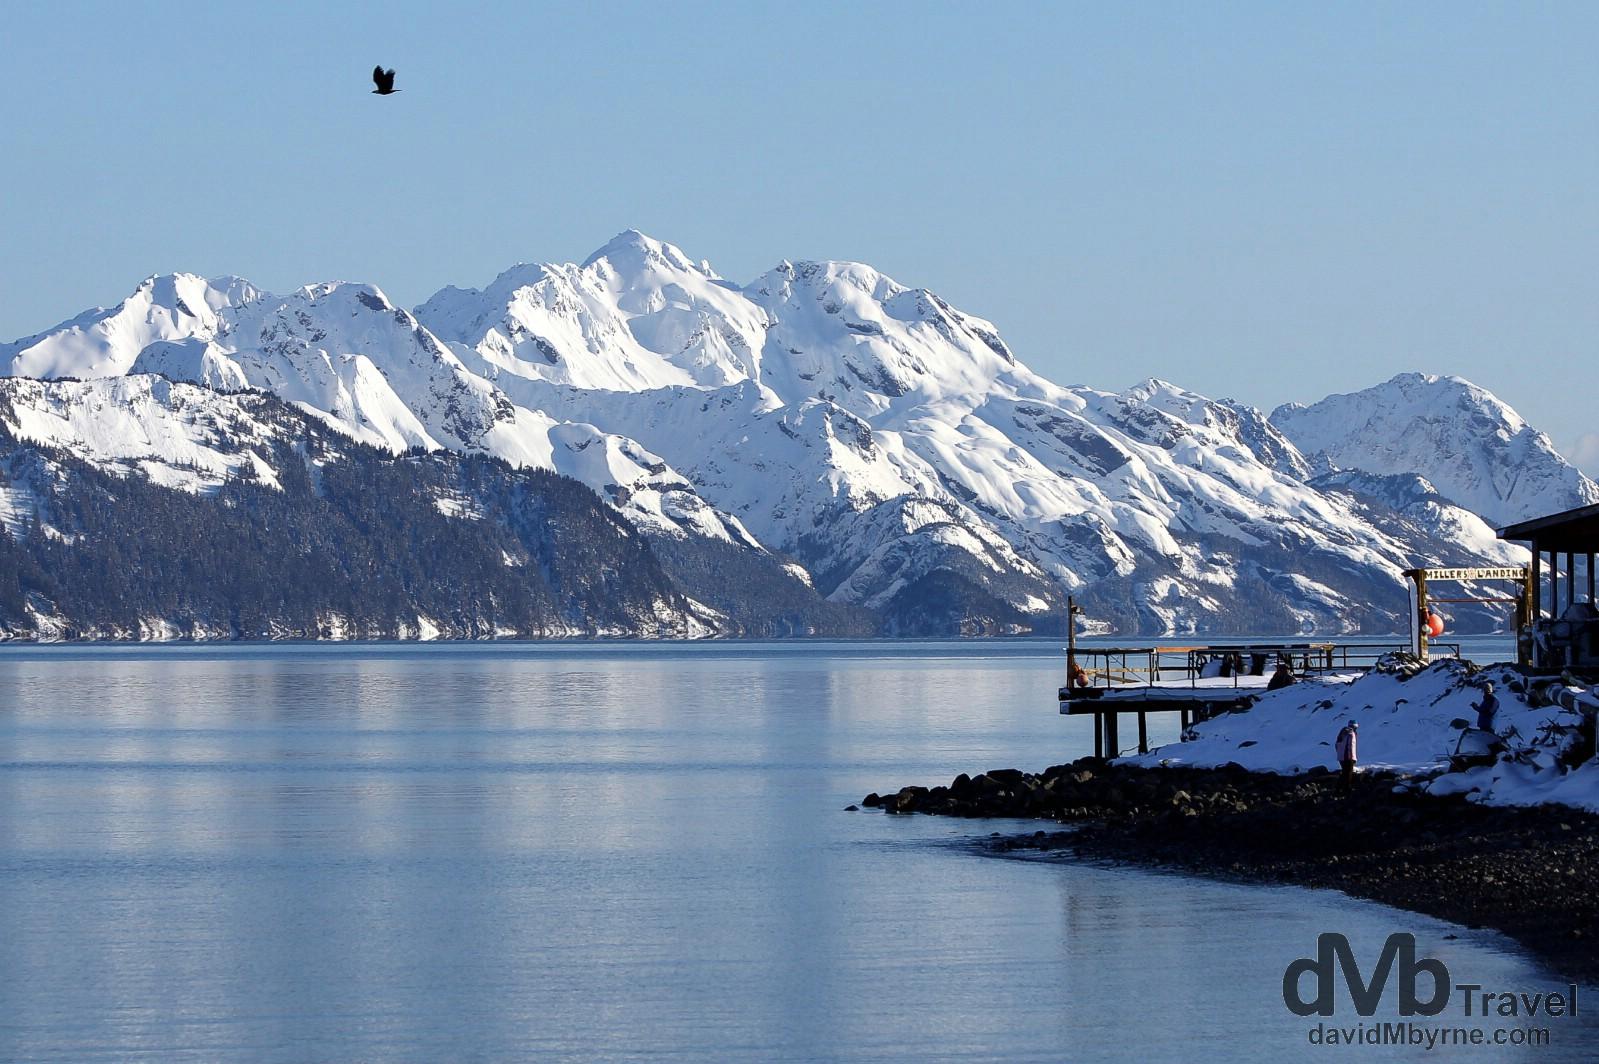 Millers Landing at Lowell Point on Resurrection Bay, Kenai Peninsula, Alaska, USA. March 15th 2013.